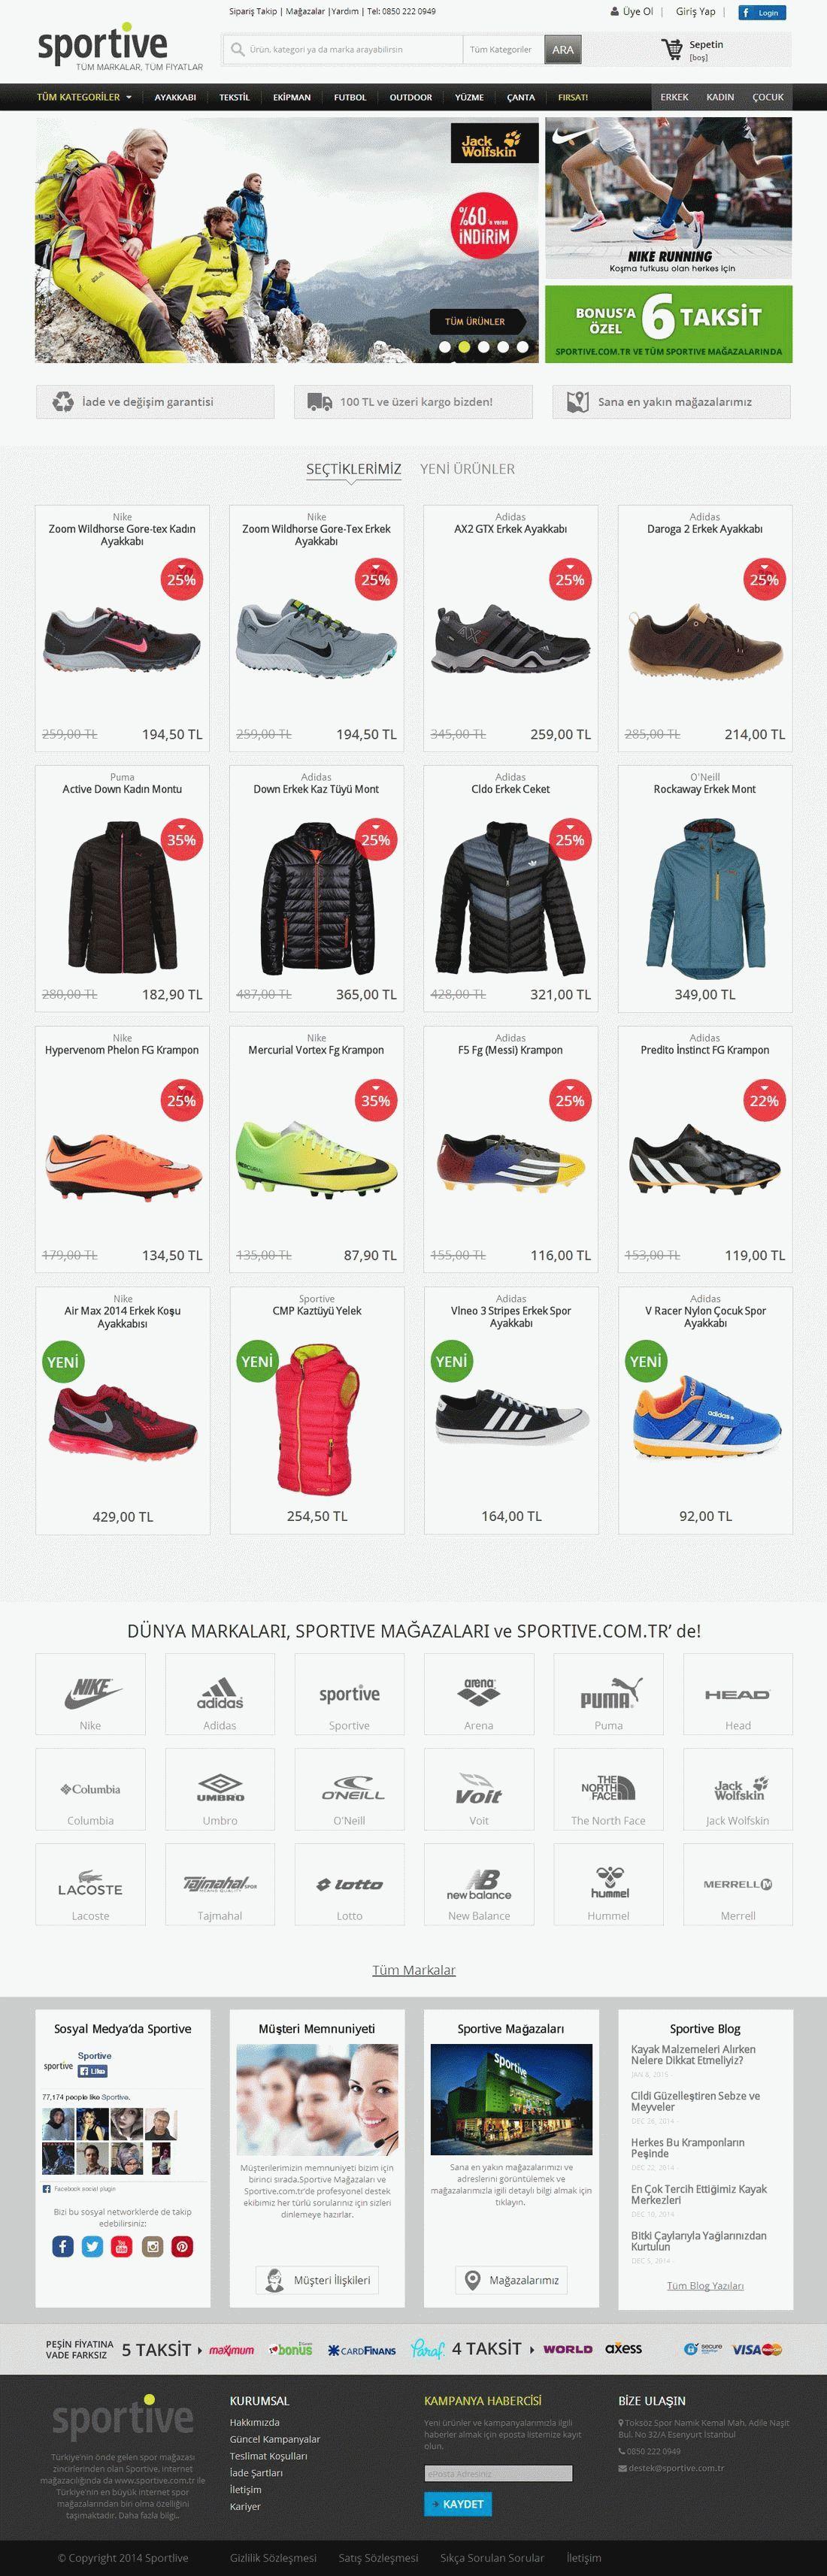 Sportive-1